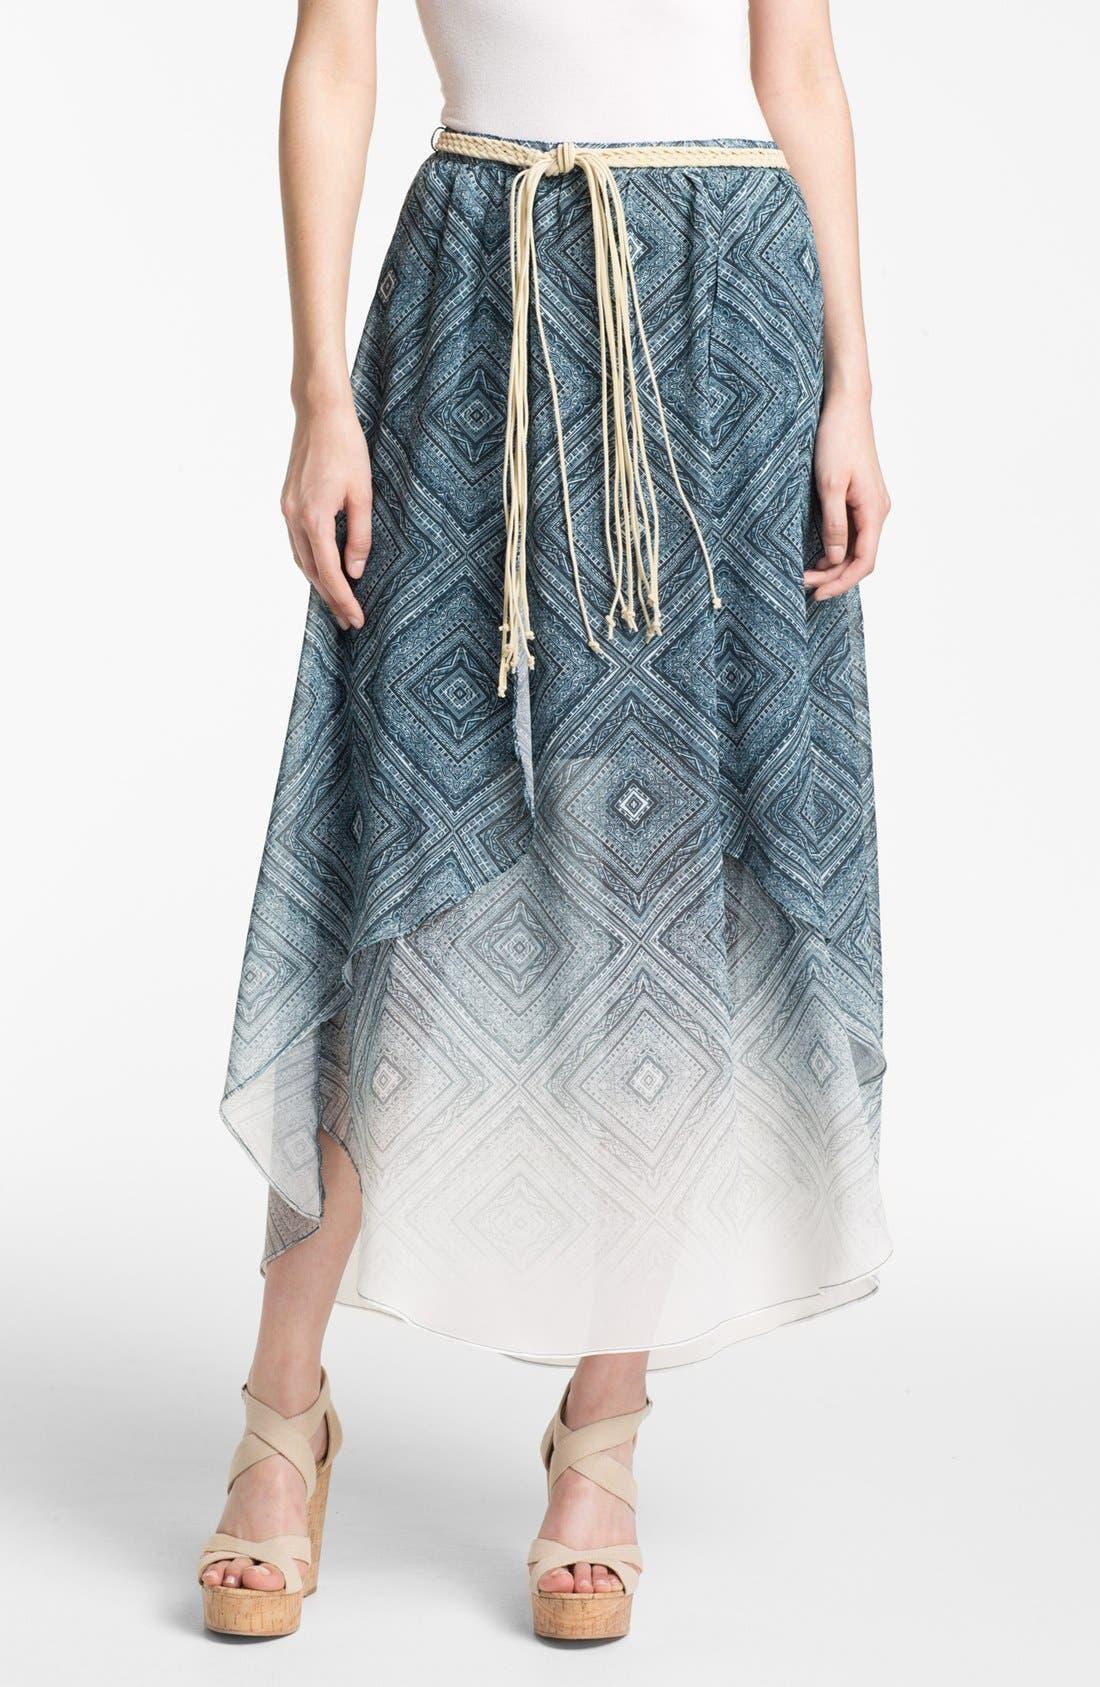 Alternate Image 1 Selected - Sanctuary Handkerchief Chiffon Skirt